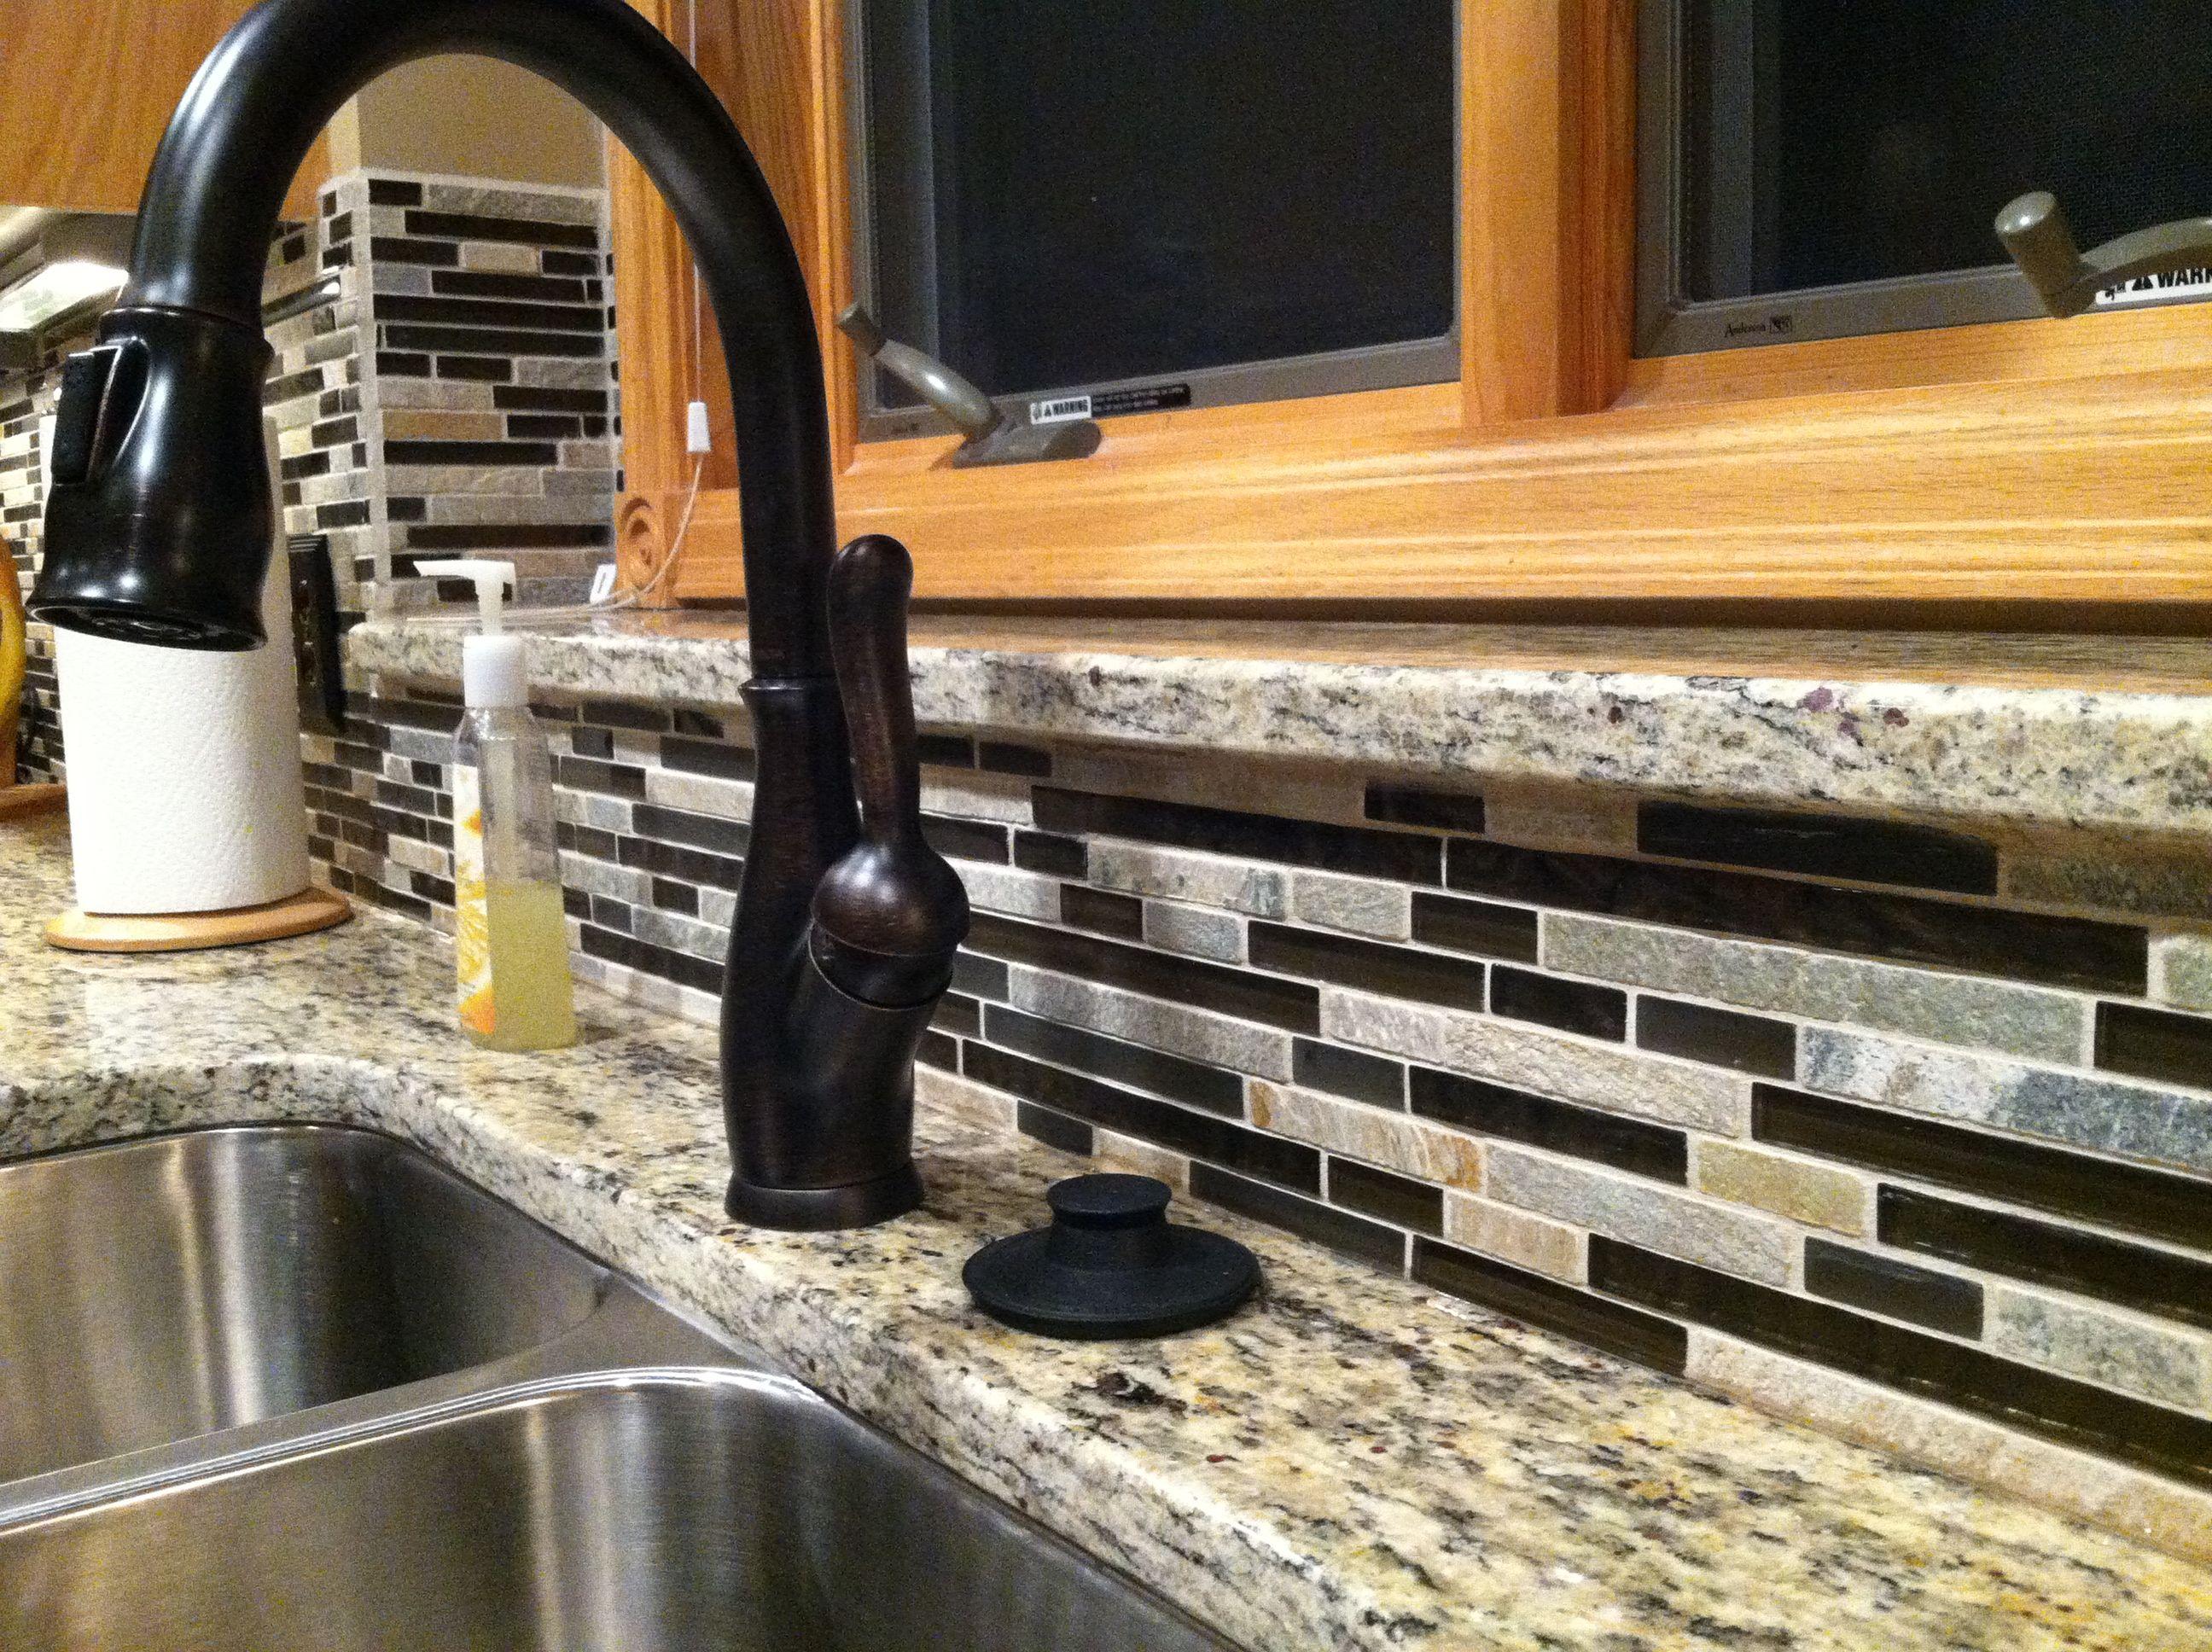 kitchen update delta bronze kitchen faucet Delta oil rubbed bronze faucet Backsplash is glass and stone MC Pacific Foil Slate